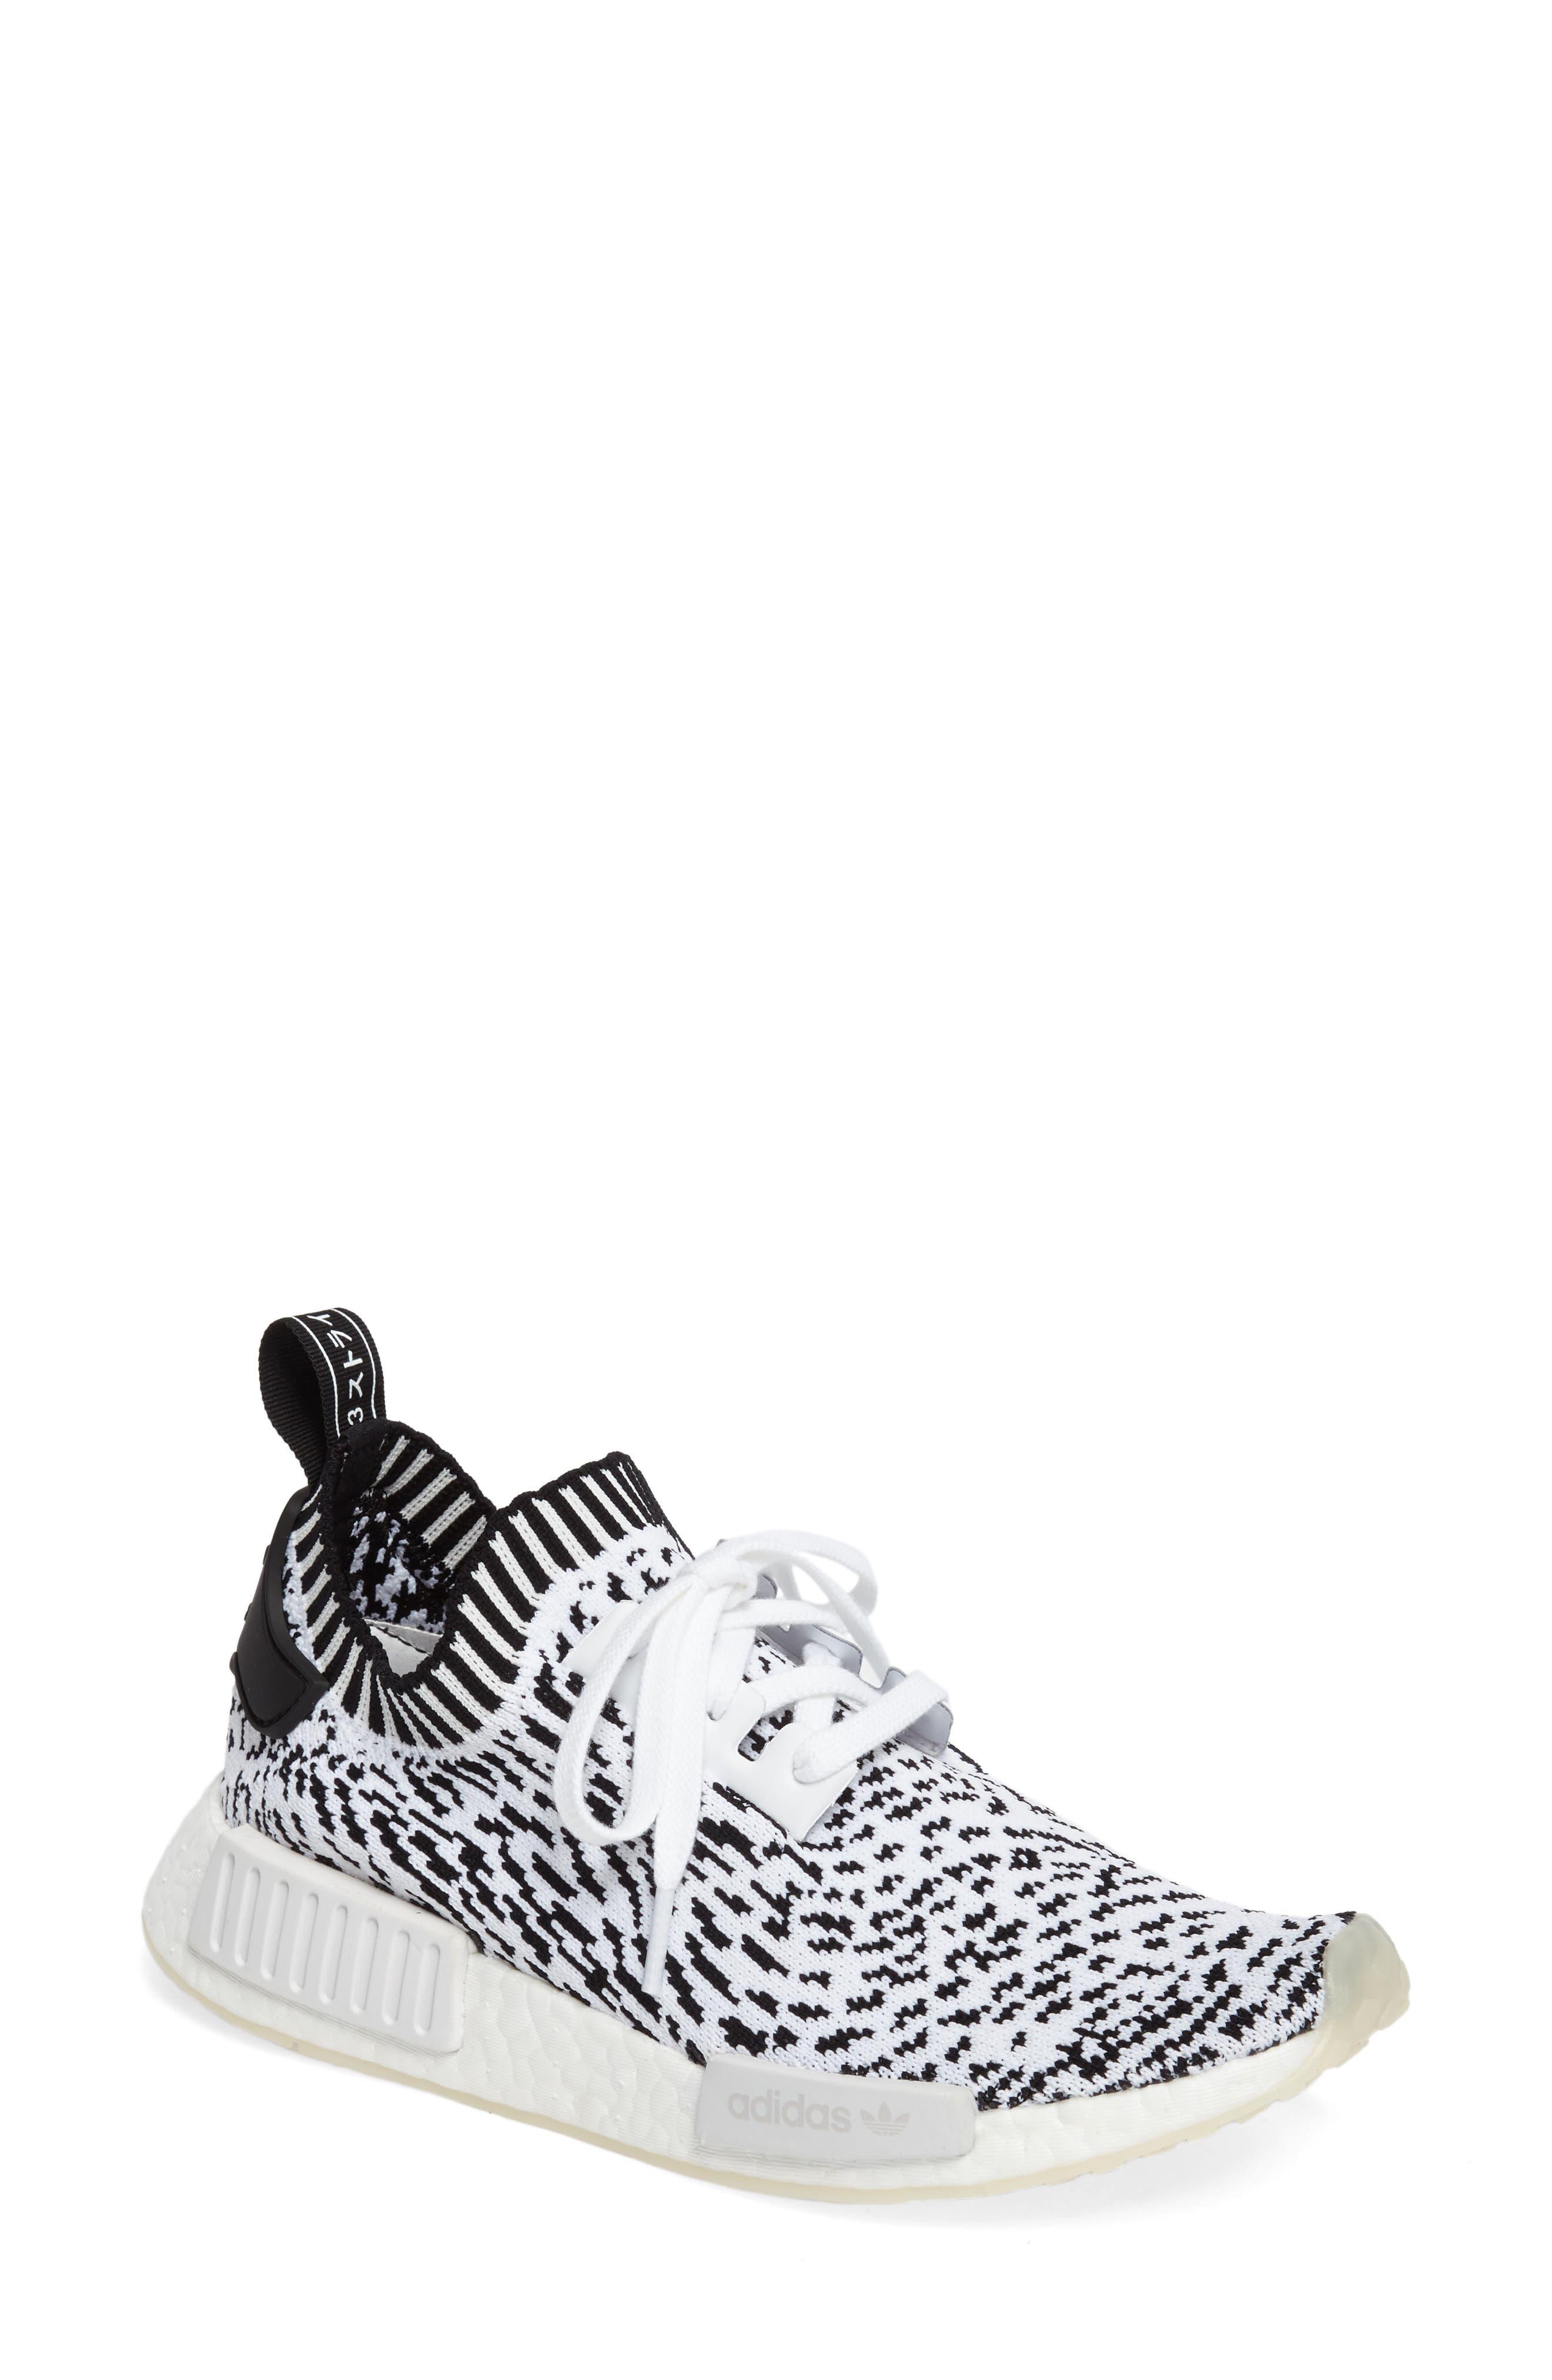 adidas NMD R1 Primeknit Running Shoe (Women)